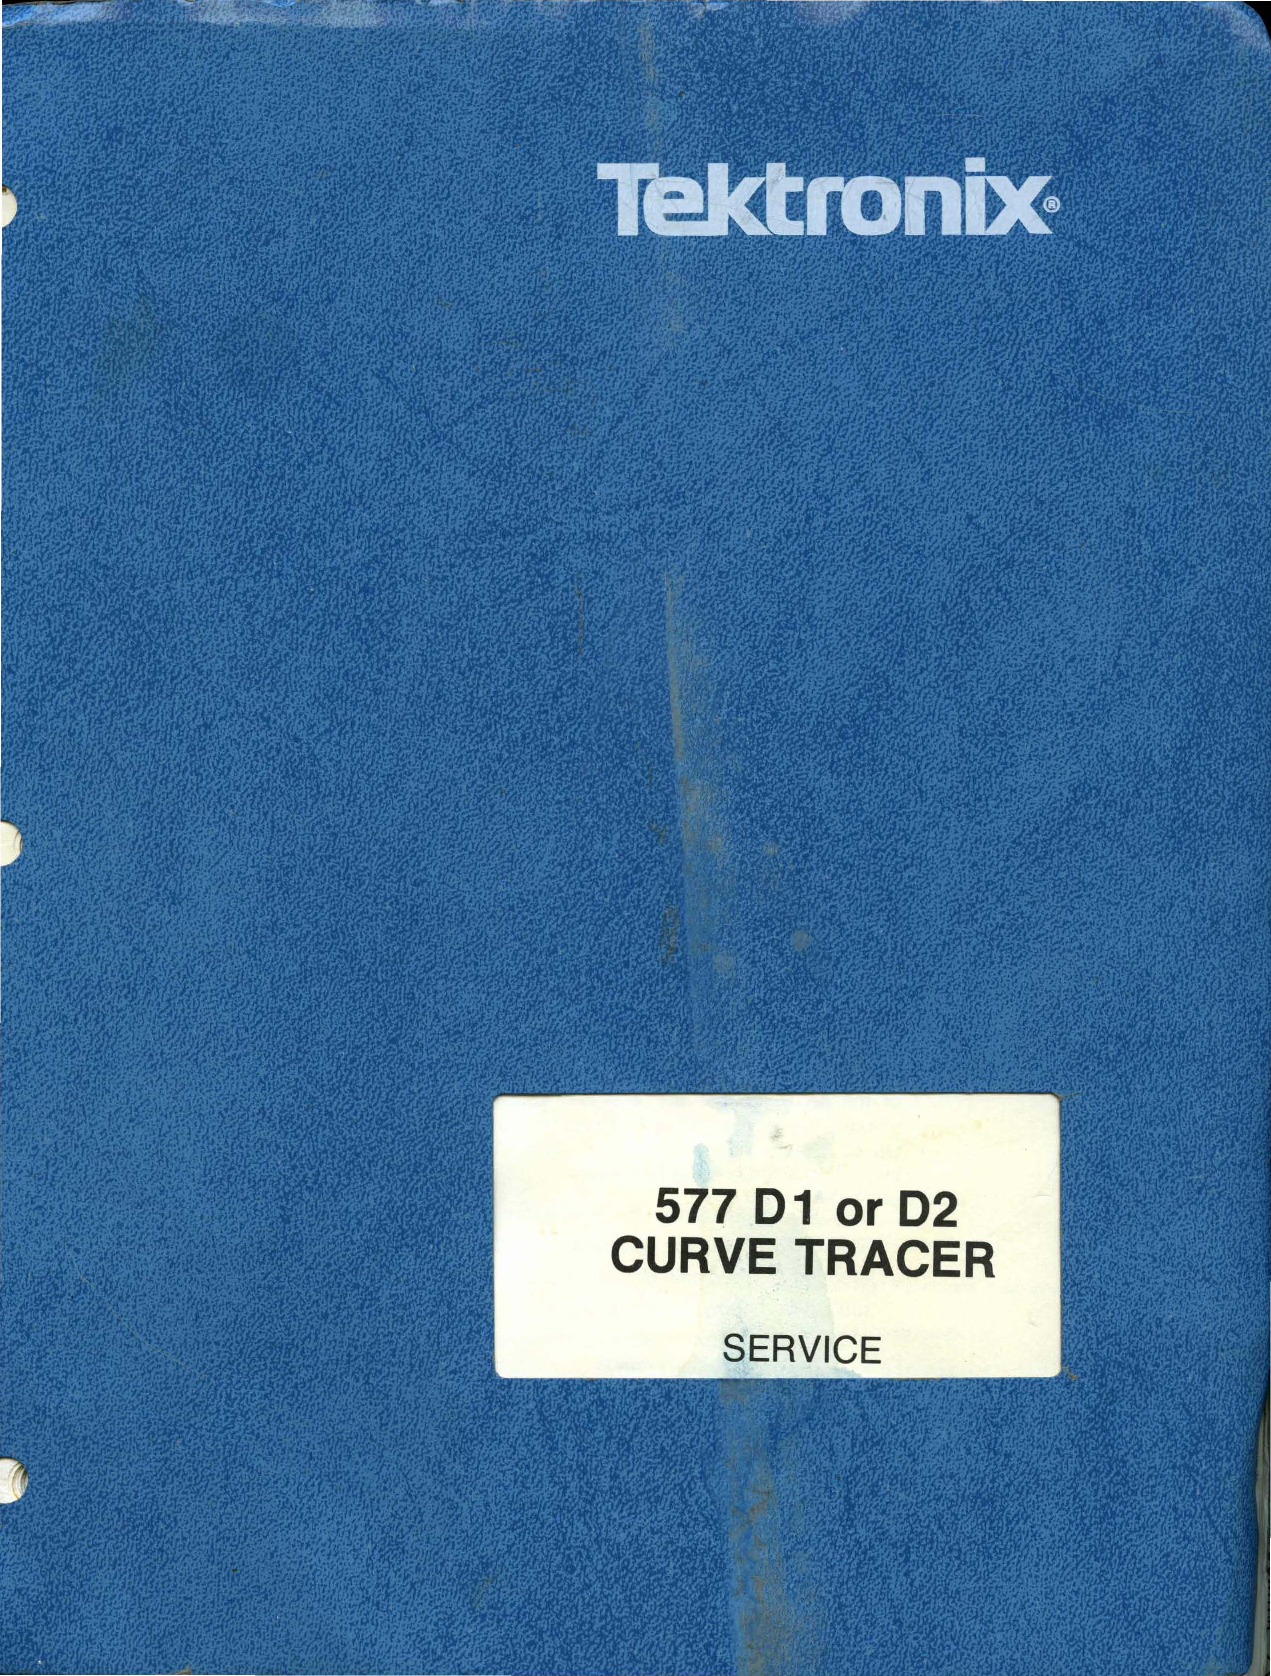 070 1414 00 Tektronix 577 Curve Tracer Service Feb88 Circuit Oscilloscope